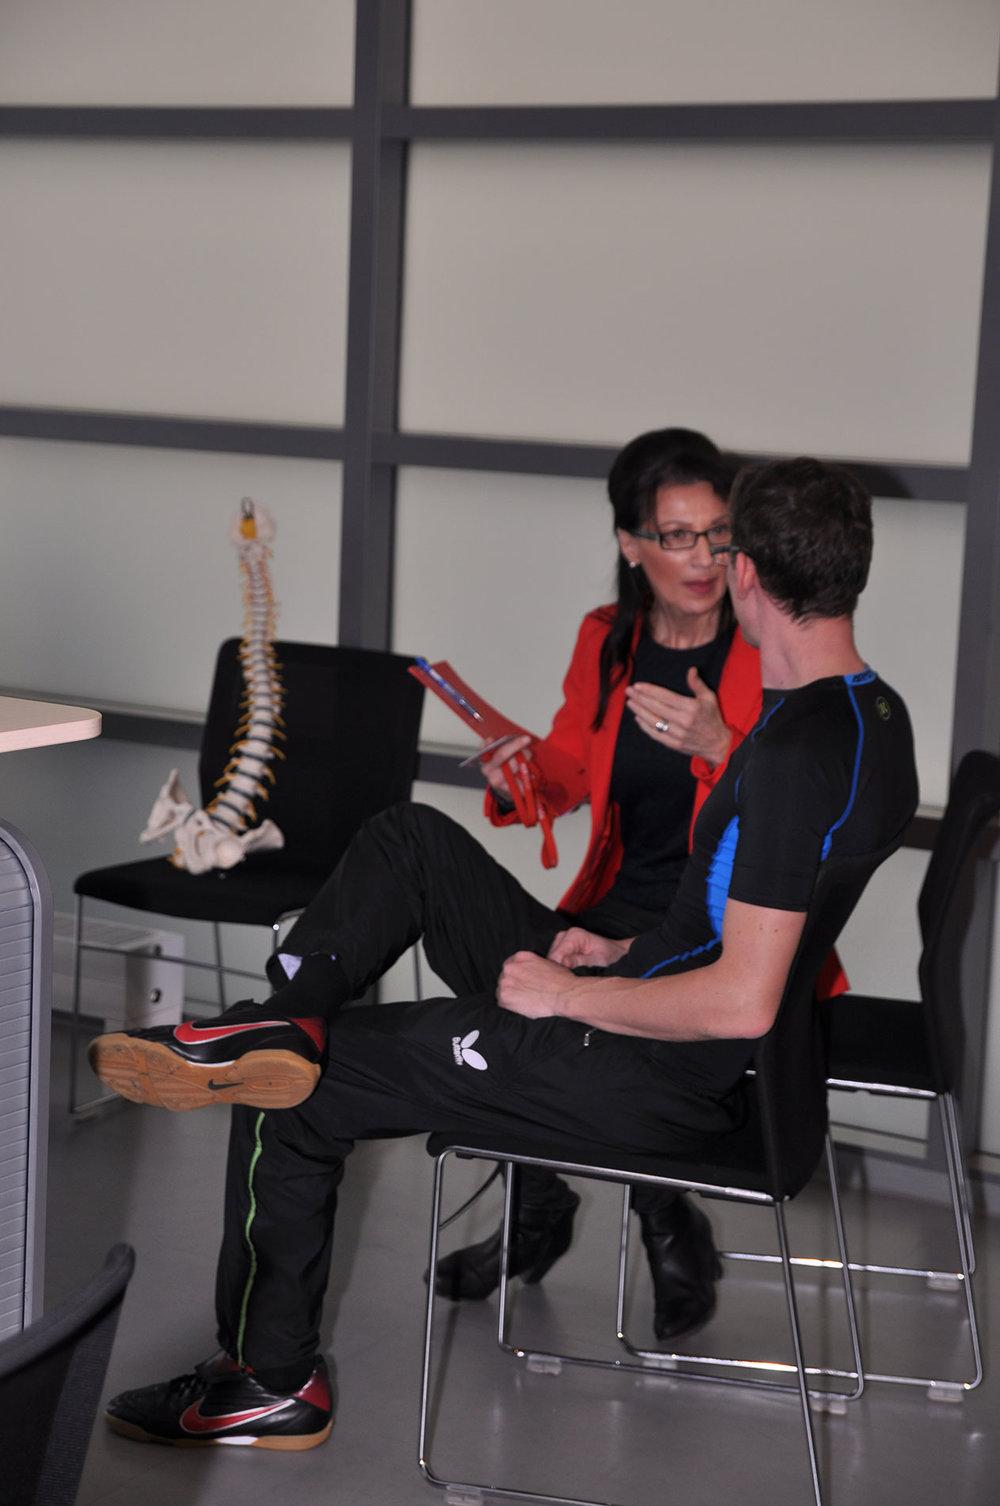 Wirbelsäulenspezialist Wien, Wirbelsäulengymnastik Wien